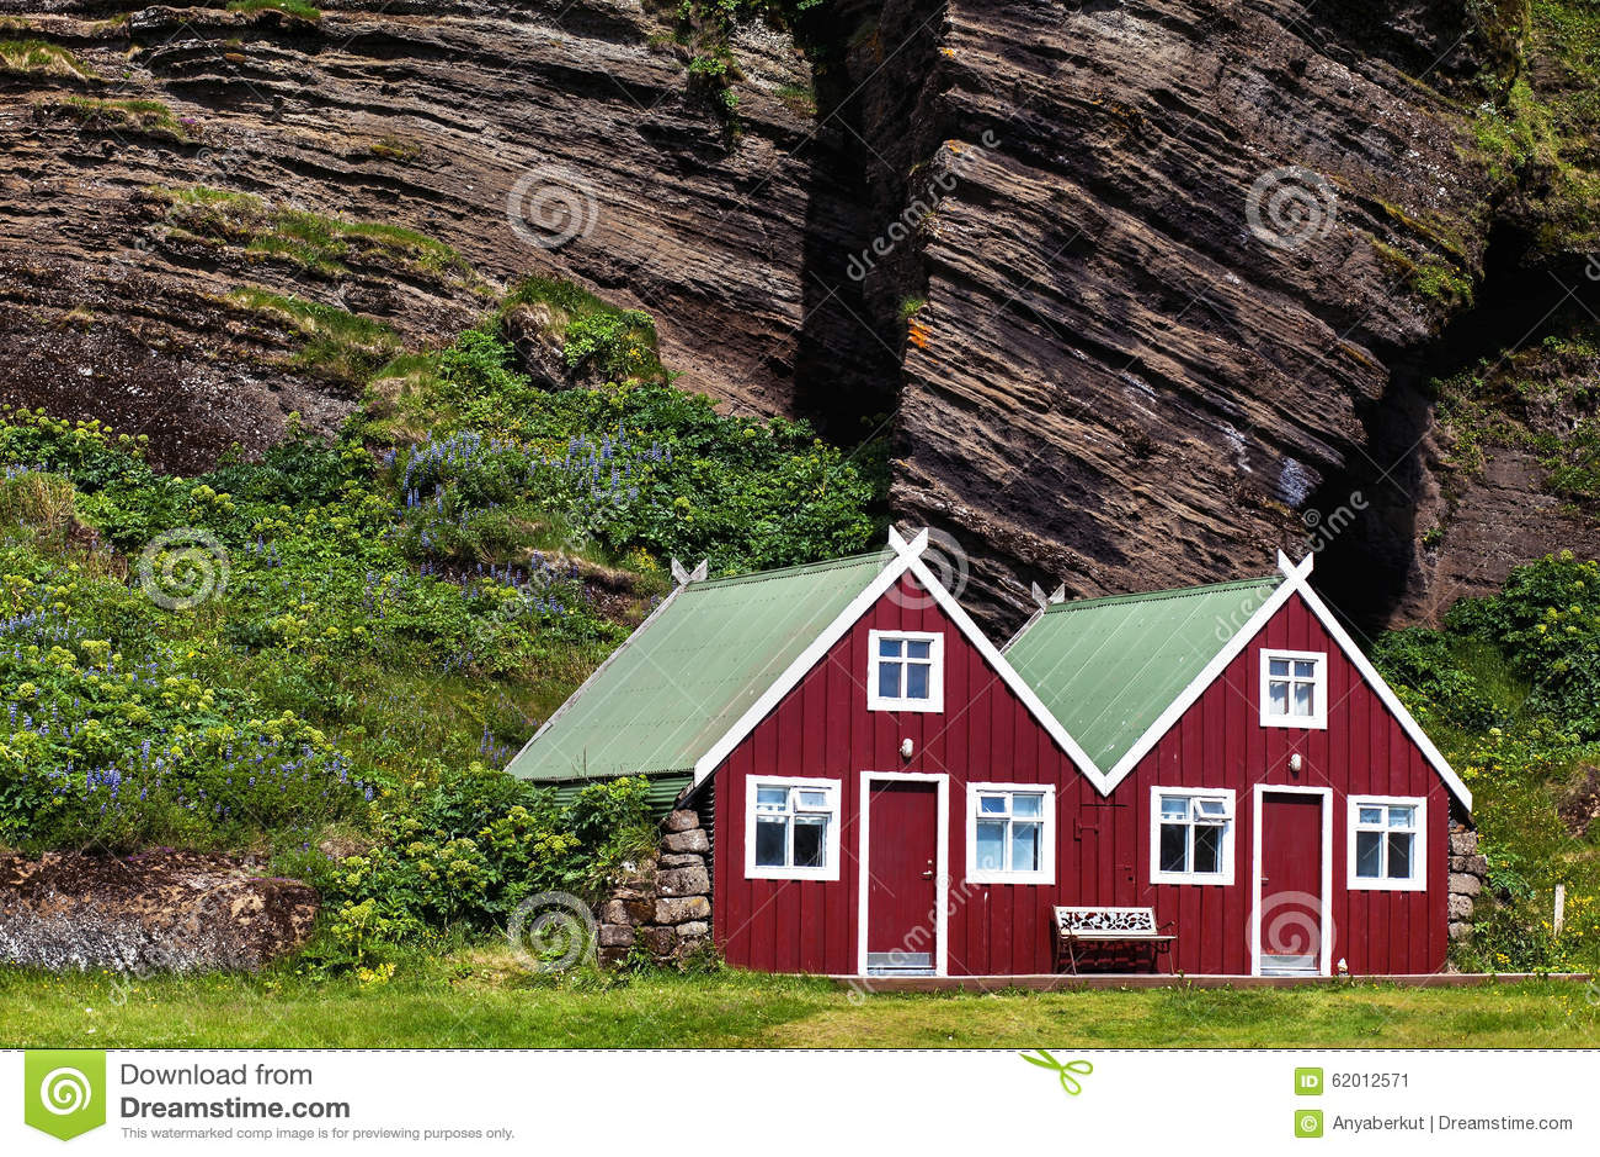 Skandinavische Holzhäuser skandinavische häuser stockbild bild zwei nord 62012571